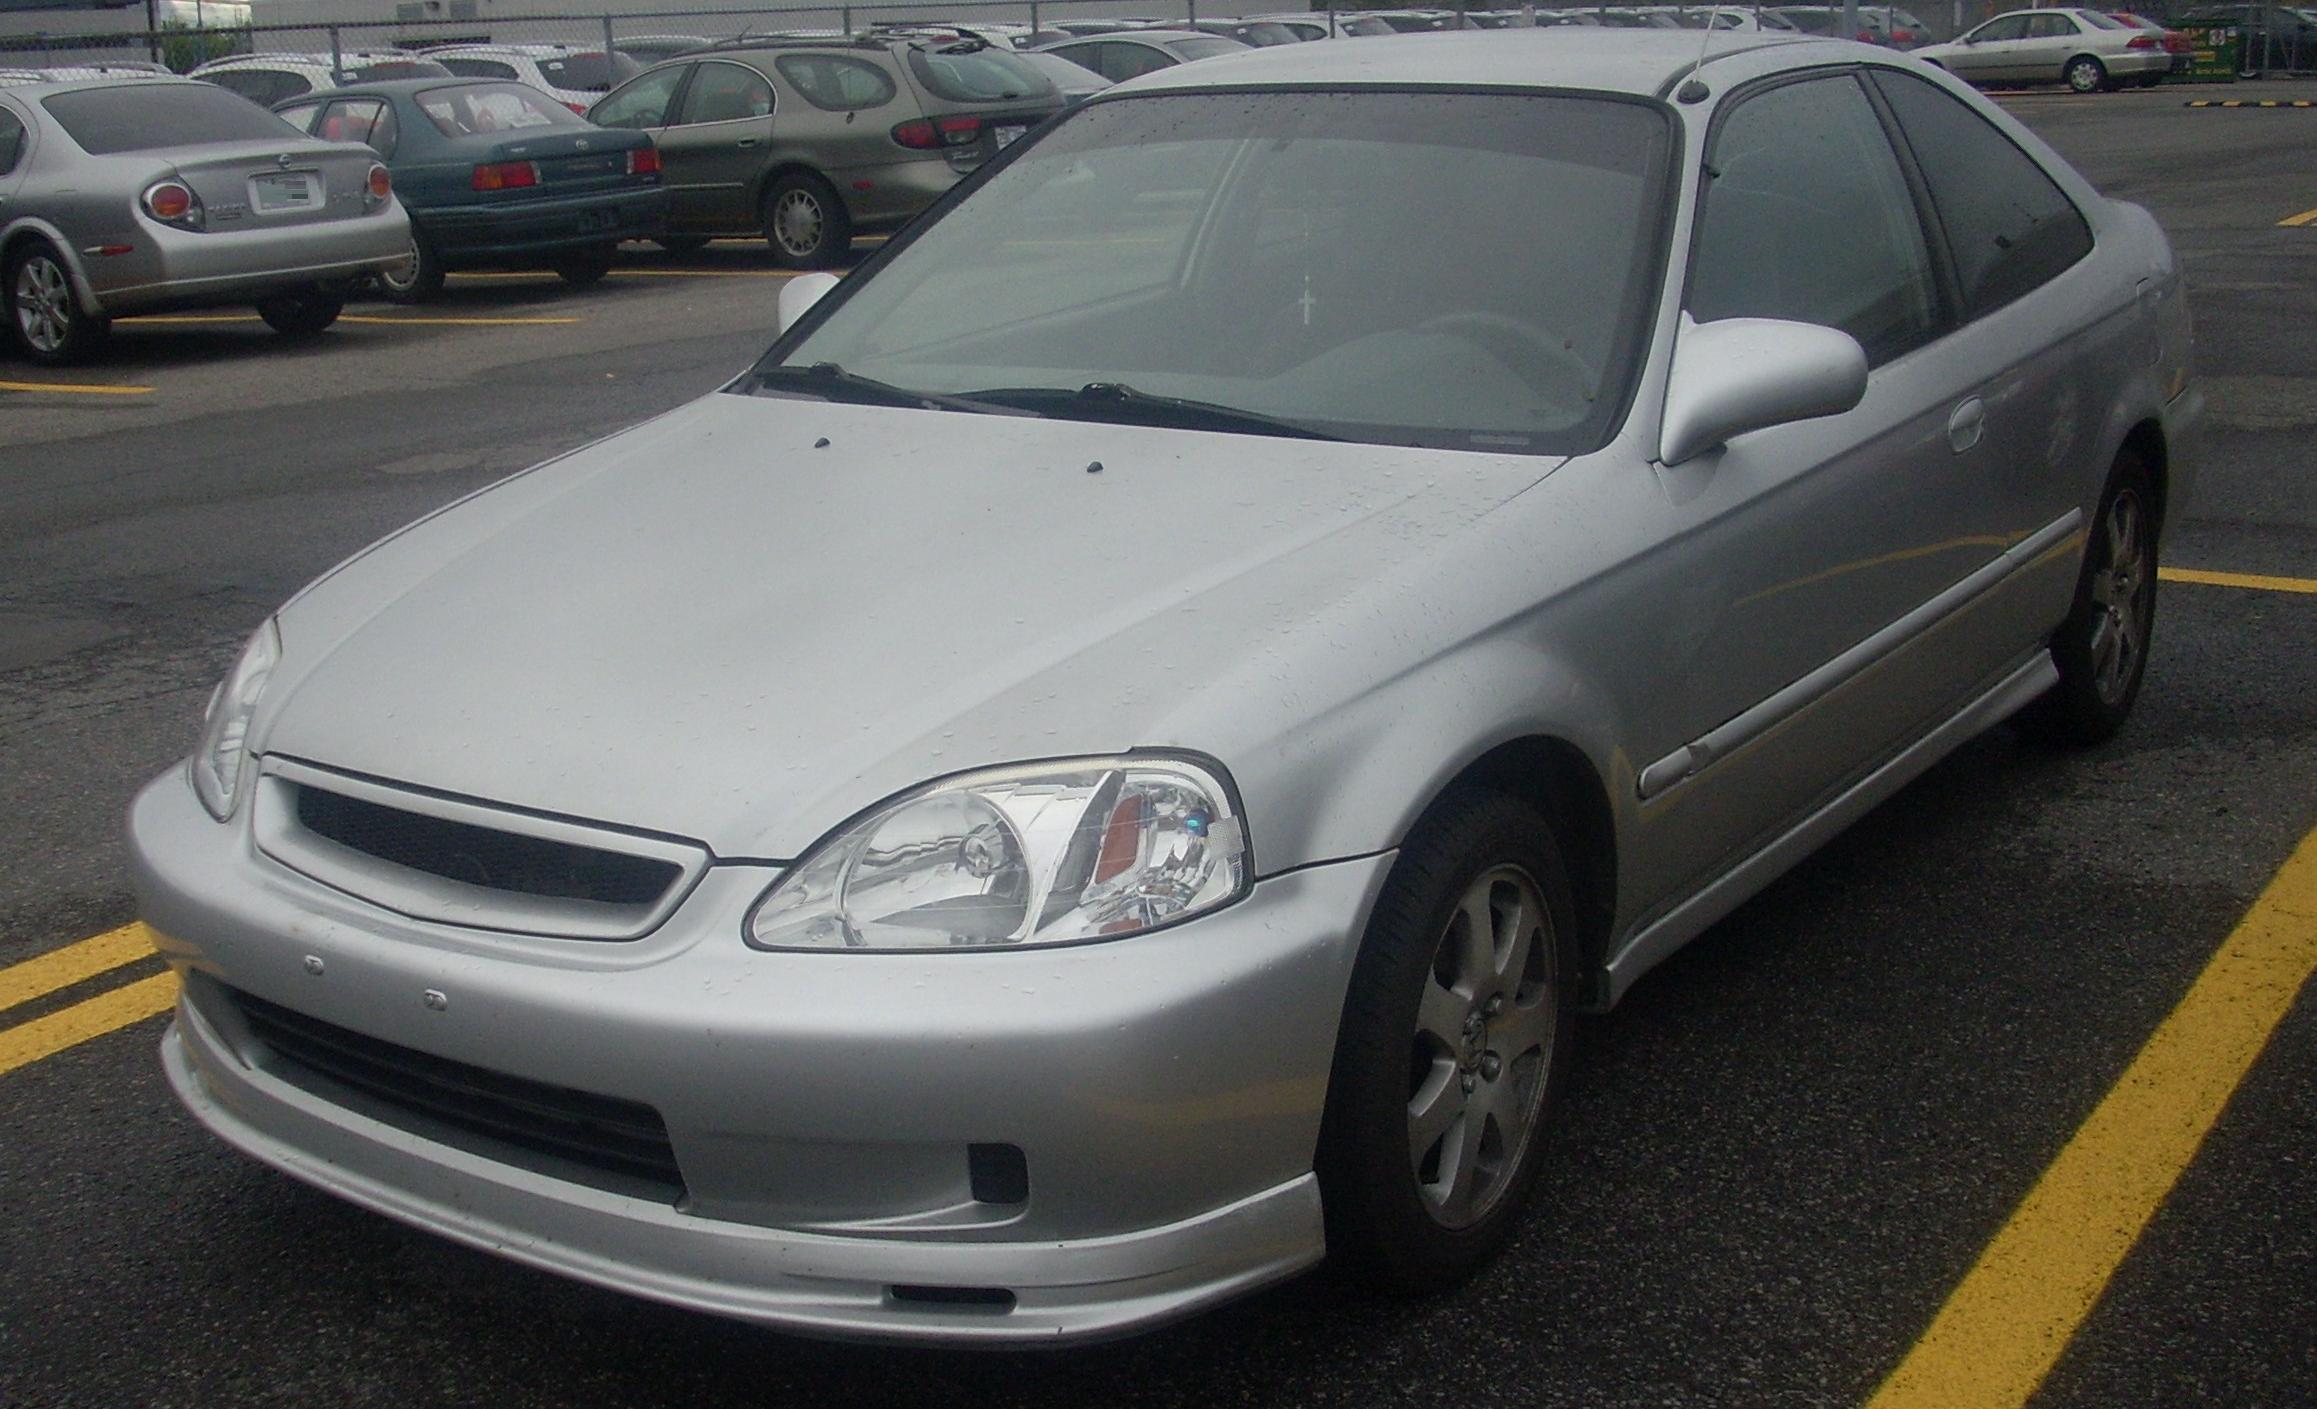 99 Civic Sedan: File:Tuned '99-'00 Honda Civic Coupe.JPG